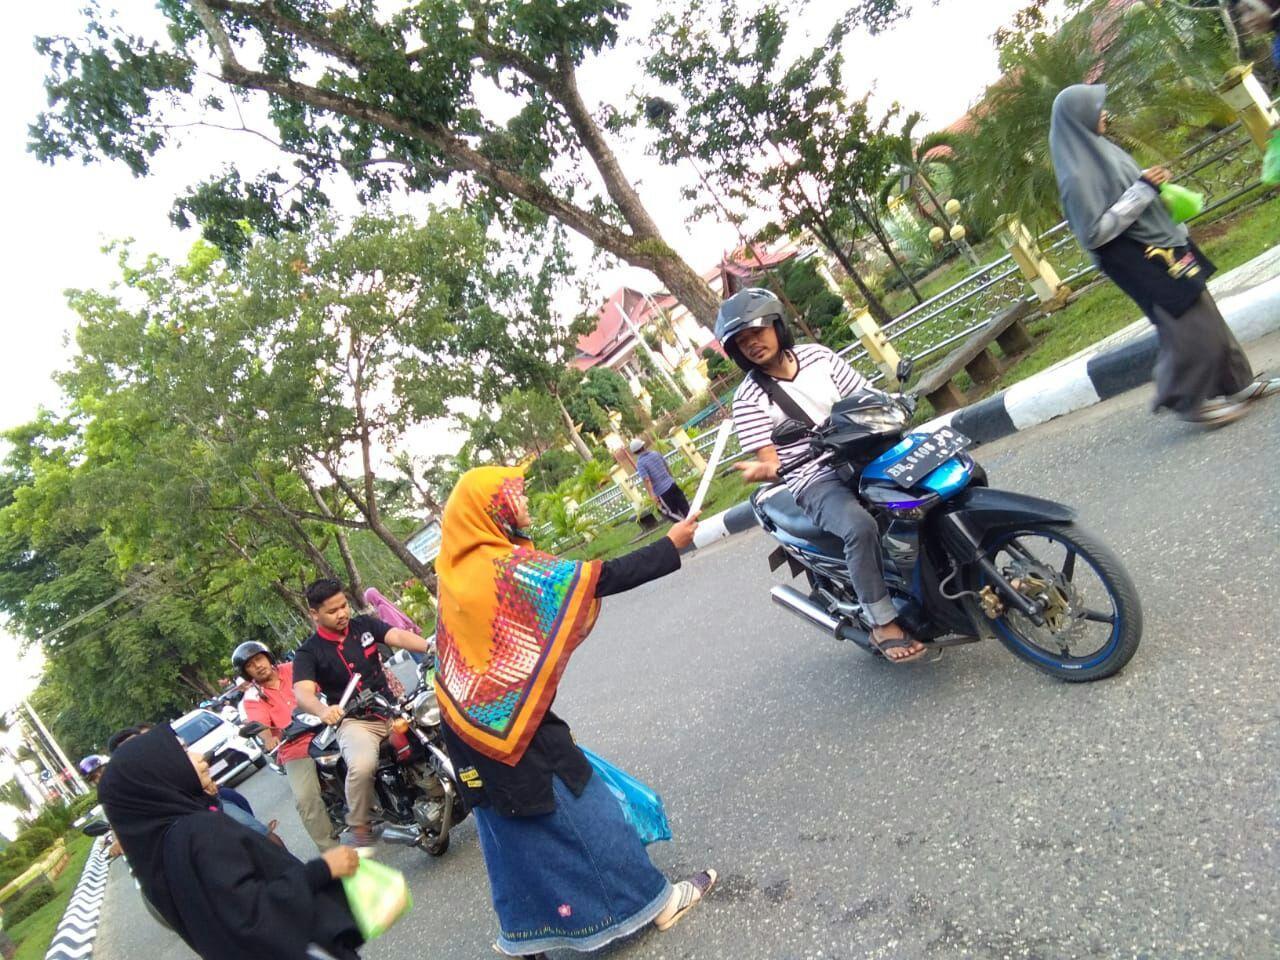 PKS Muda Merangin bagi Takjil dan Kalender Fajar